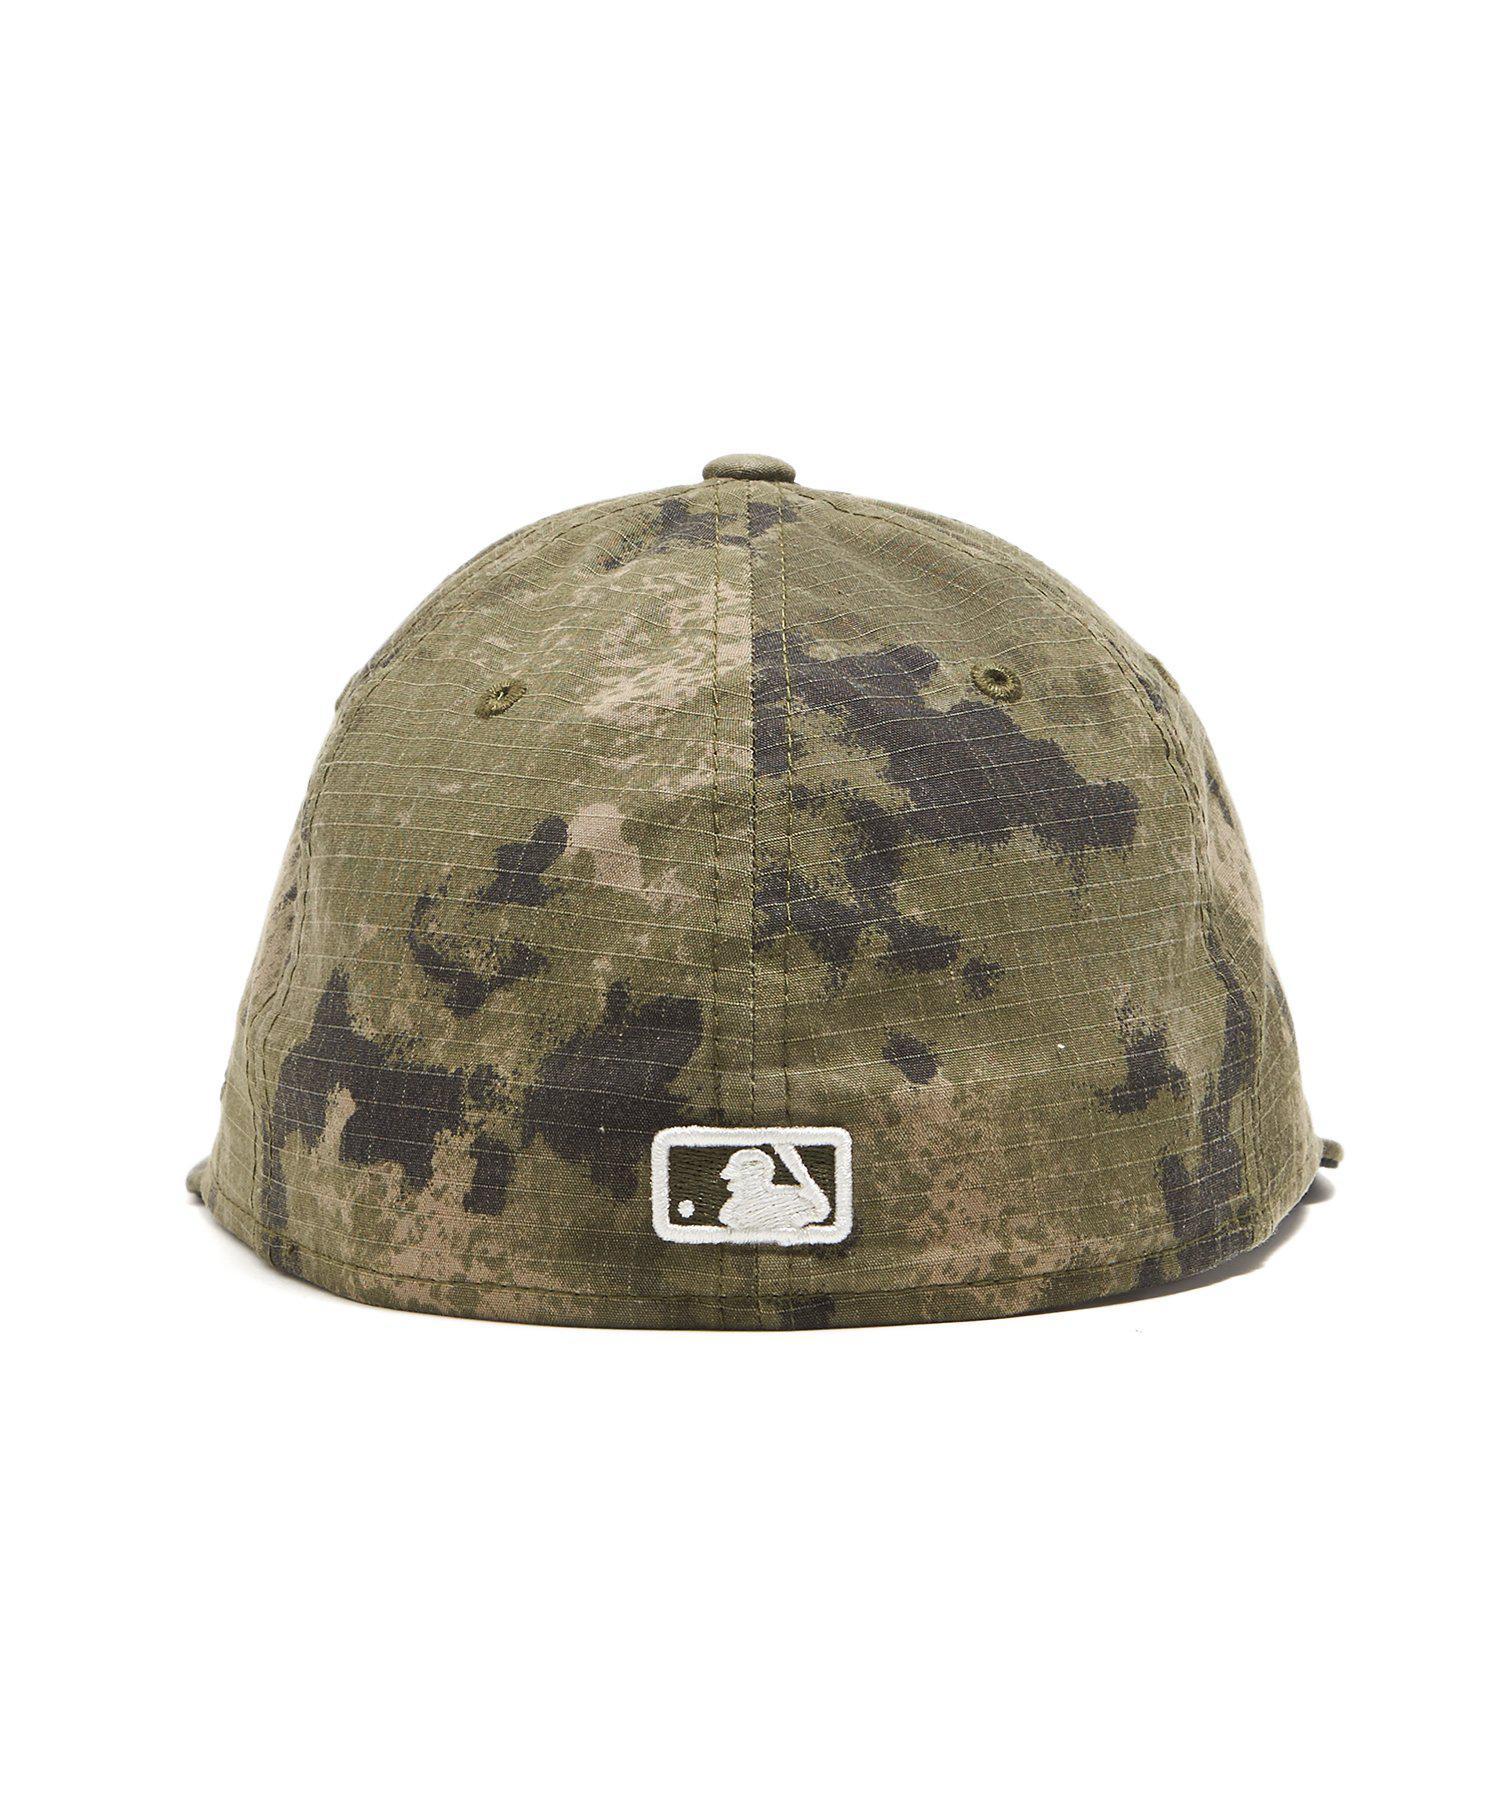 1c18e4333d7 Lyst - NEW ERA HATS New York Yankees Cap In Camo Ripstop in Green ...